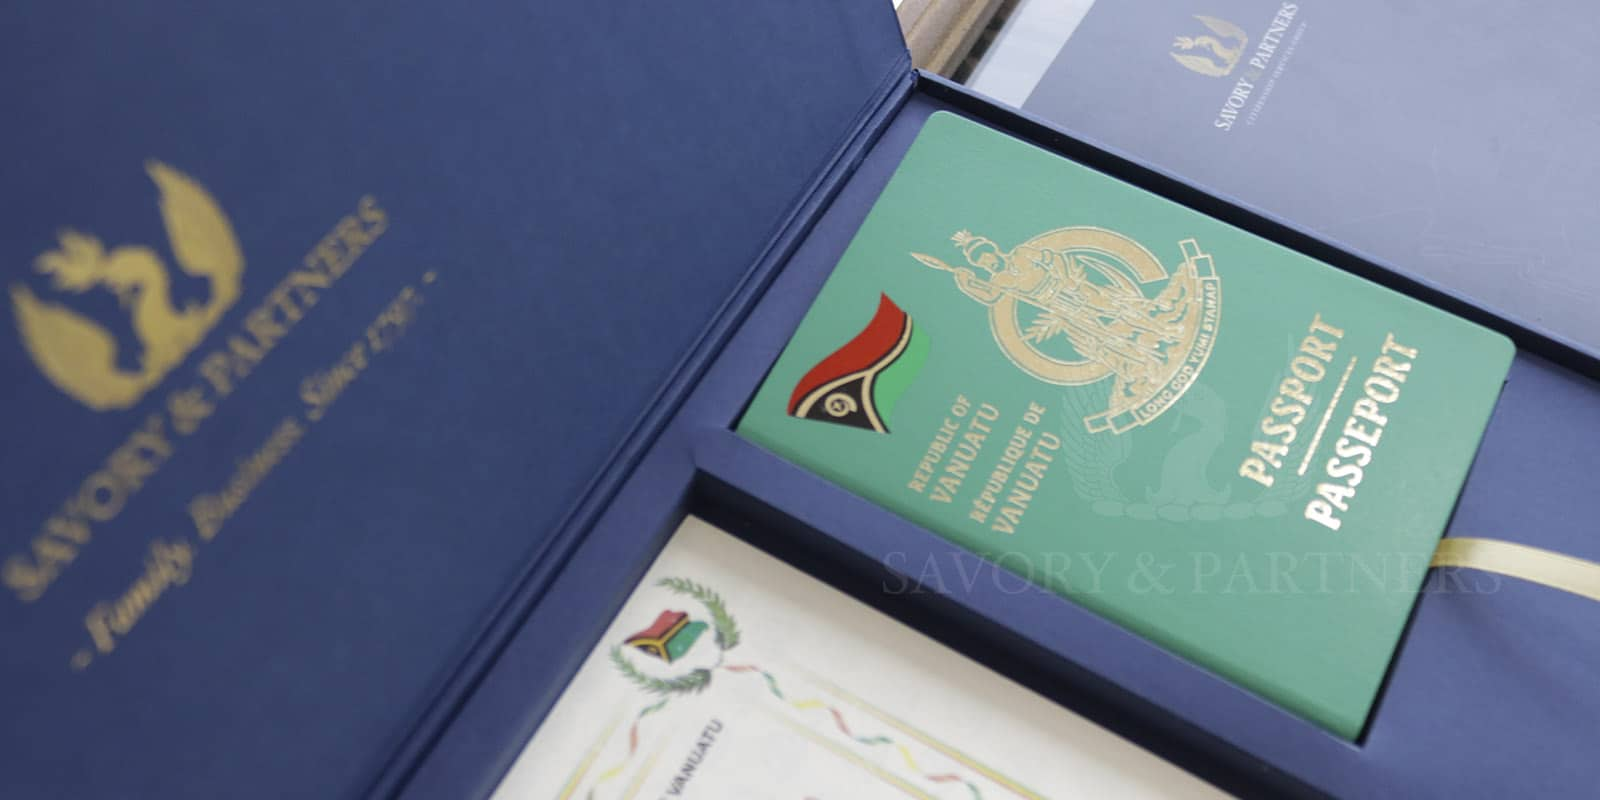 Vanuatu passport at Savory & Partners offices in Dubai